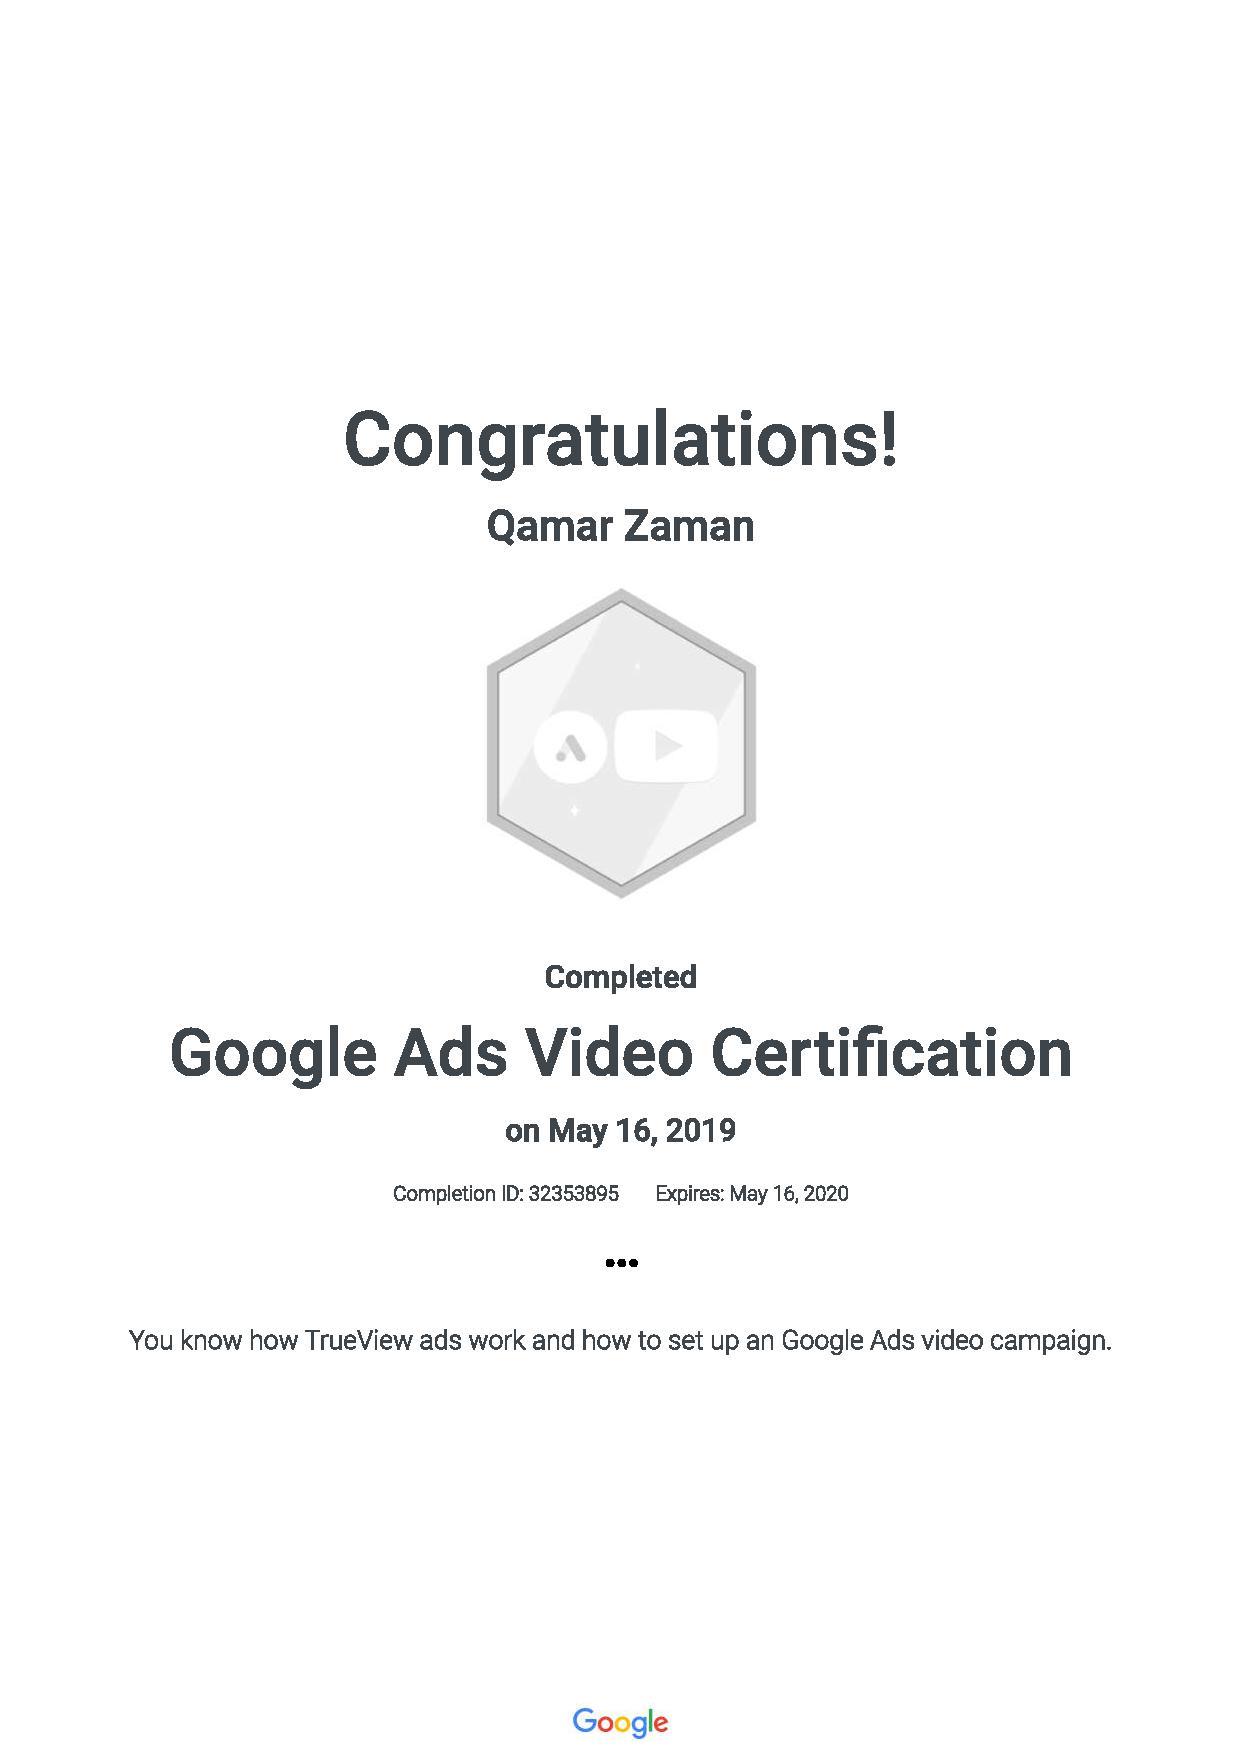 Google Ads Video Certification 201905